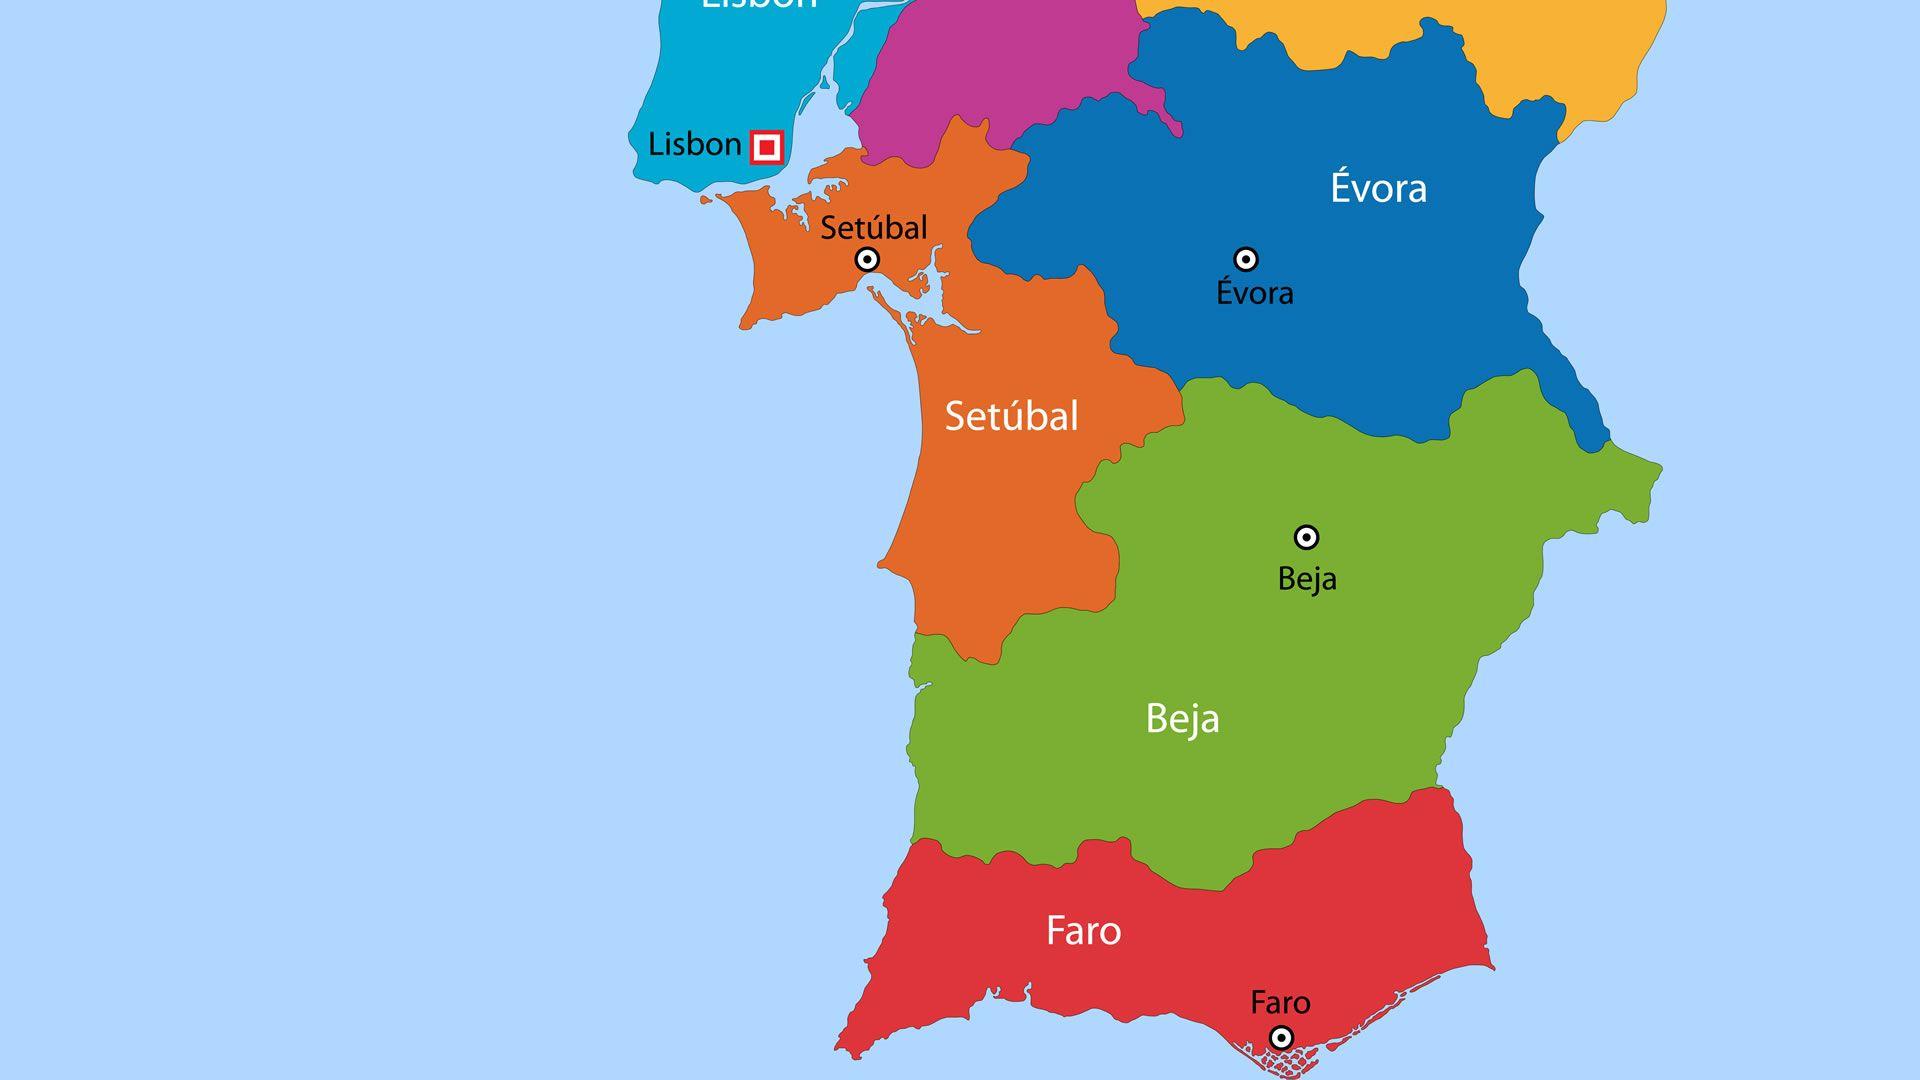 Mapa Político De Portugal Zona Sur Mapas Del Mundo Pinterest - Portugal mapa